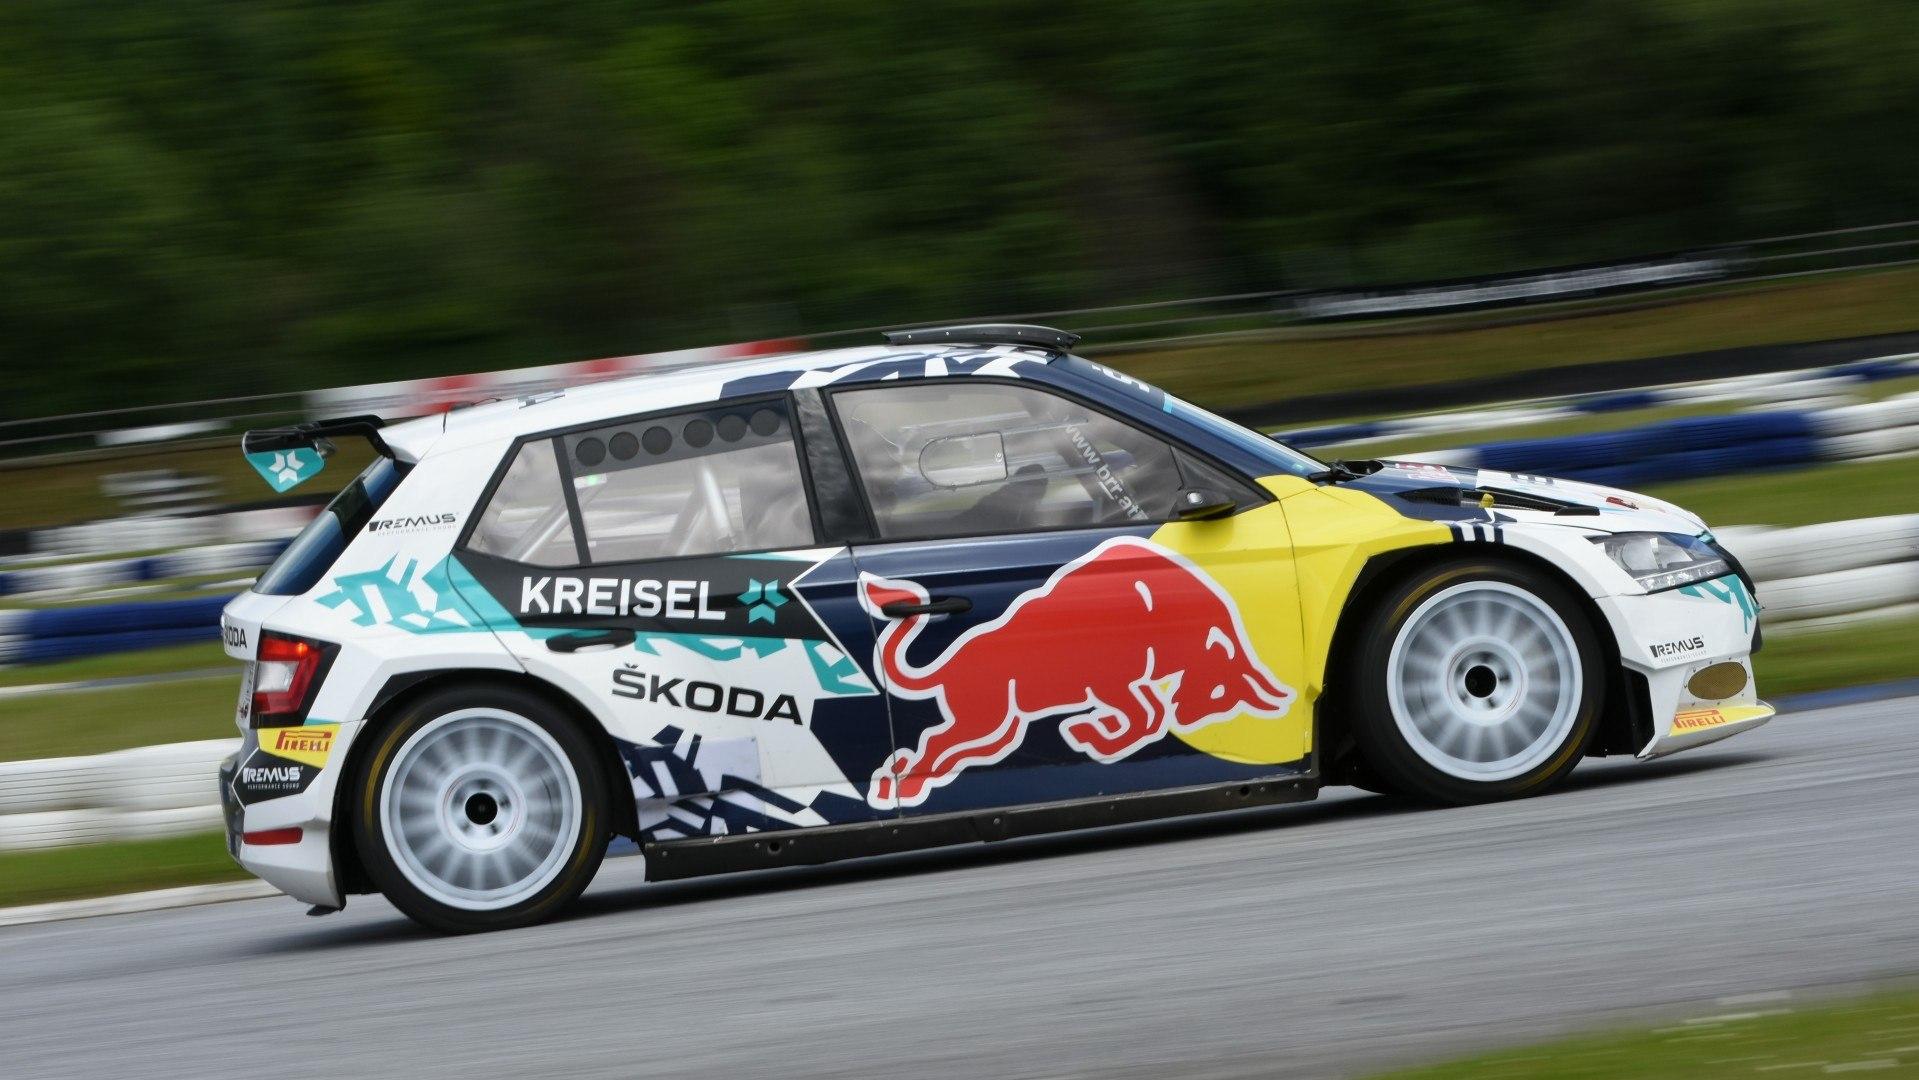 Skoda Fabia RE X1 Kreisel Coche de Rally Electrico (3)